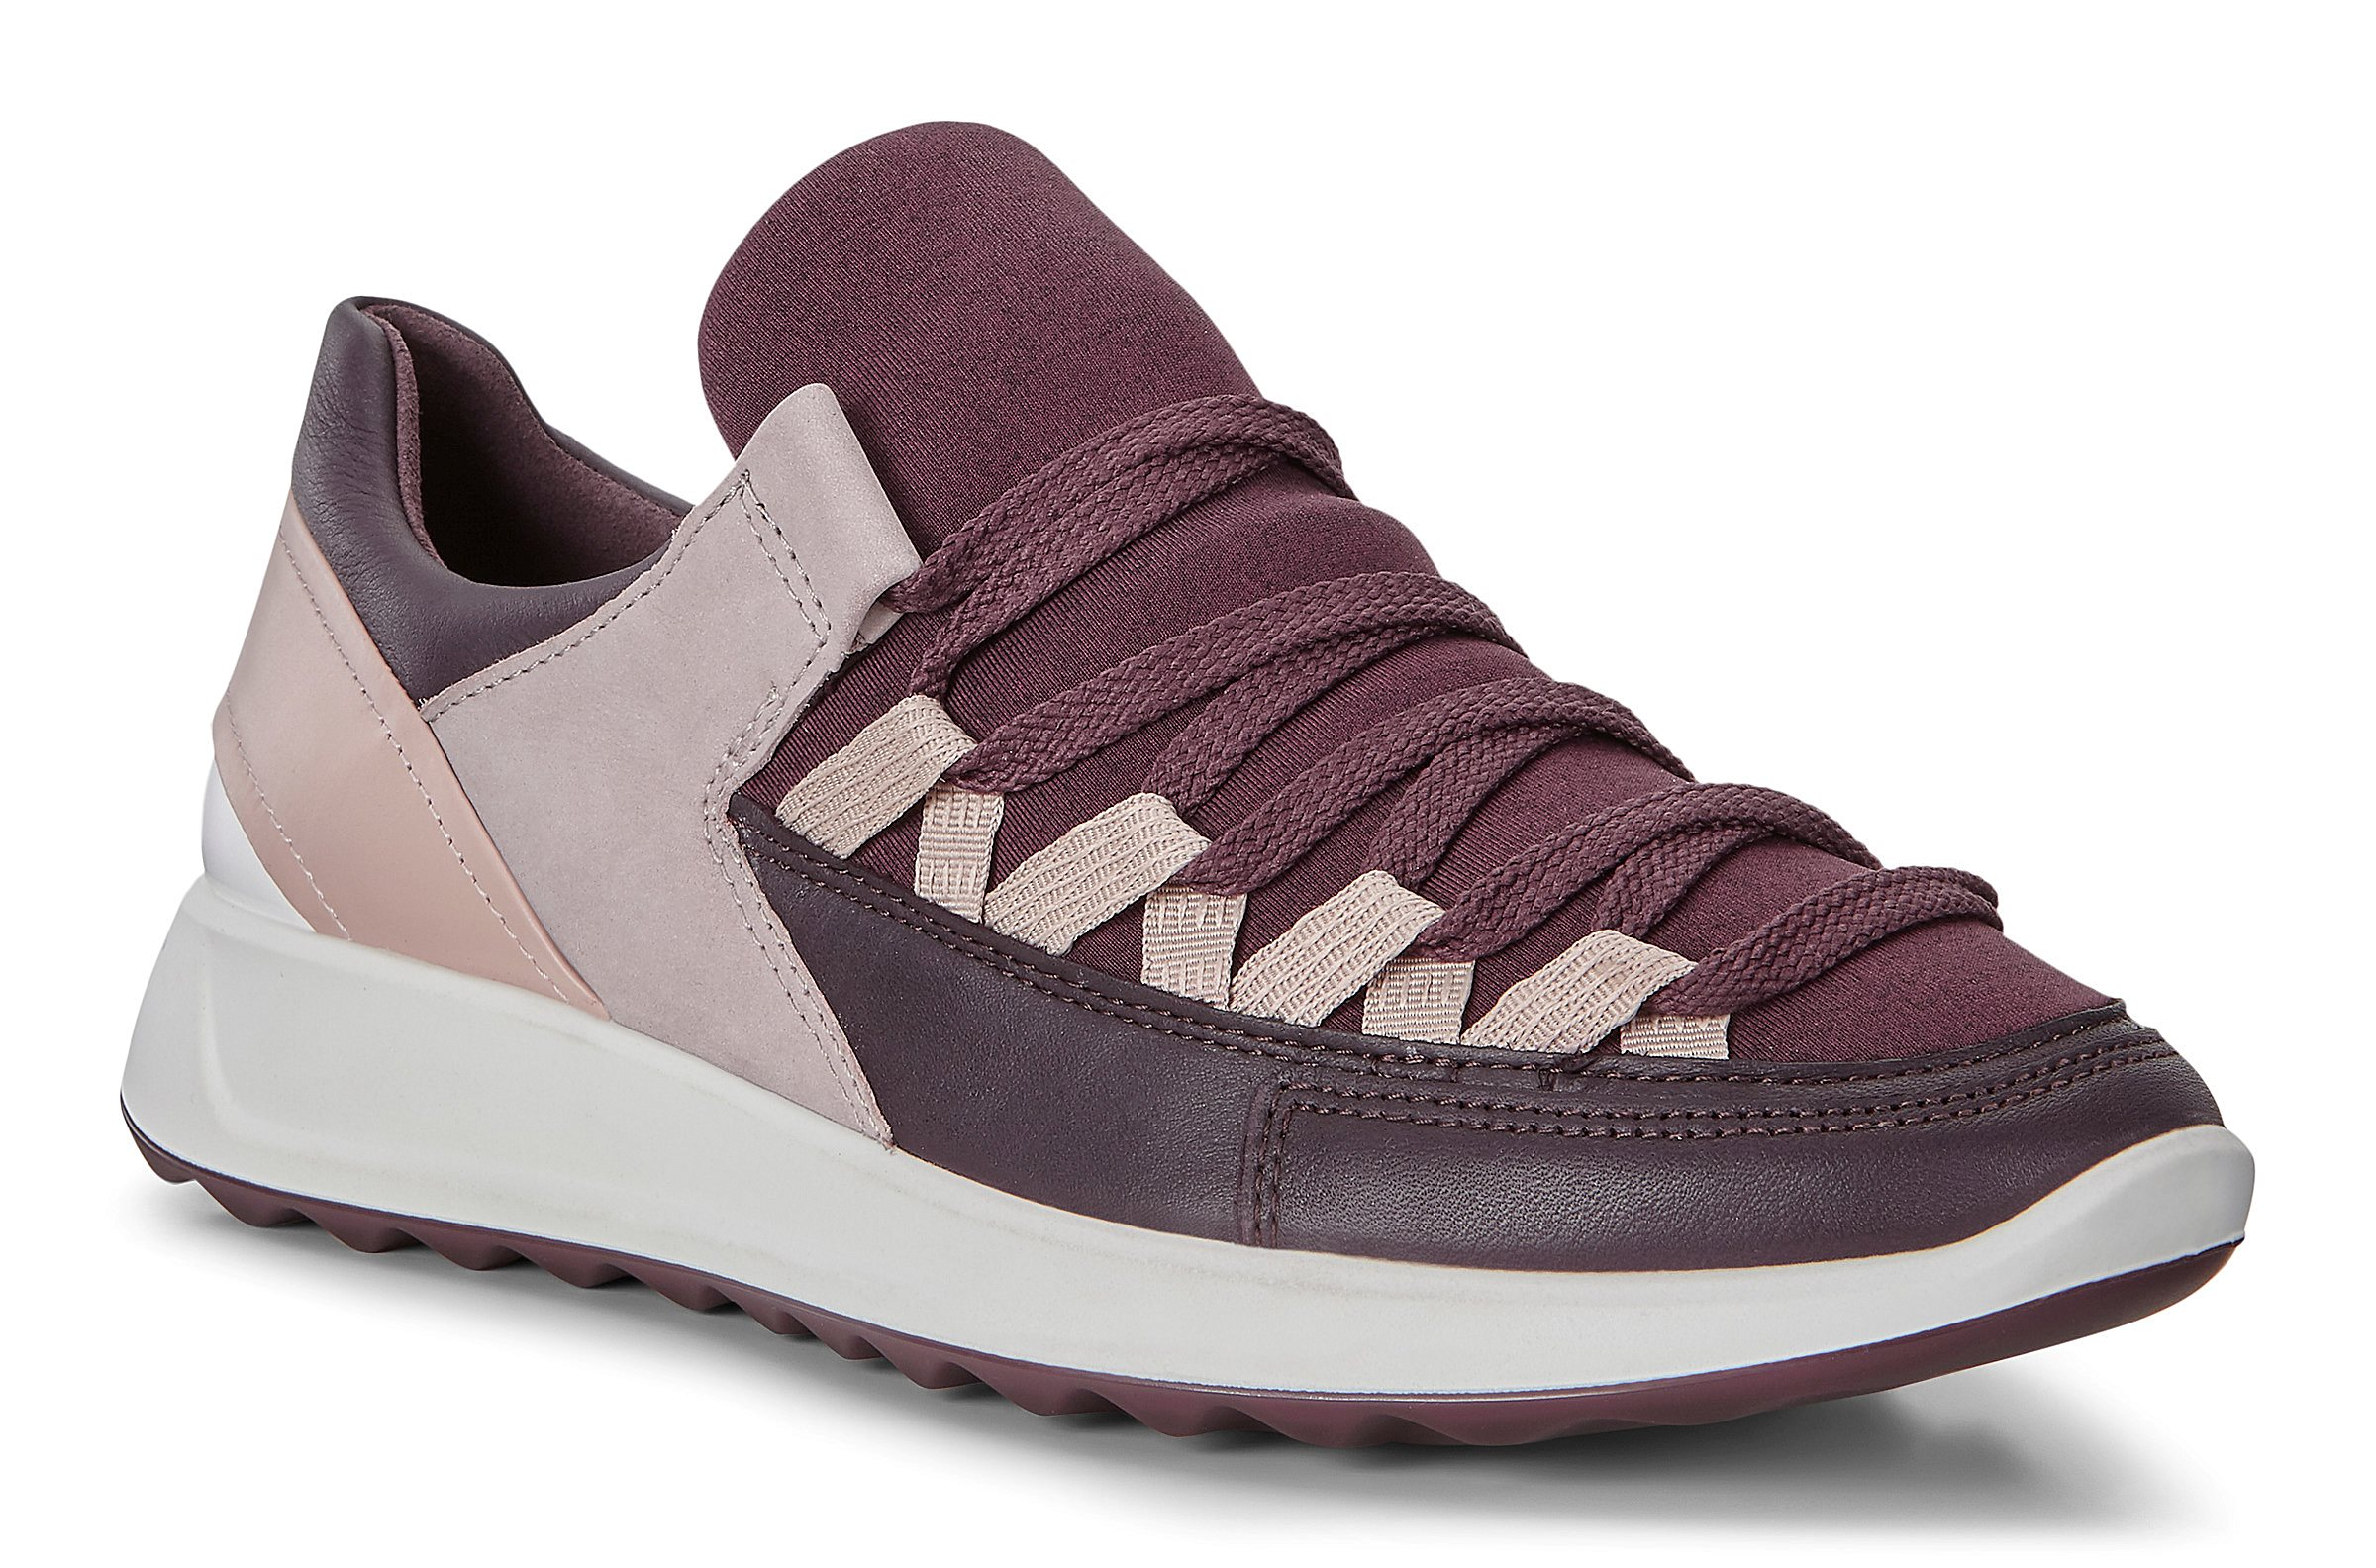 Damen Schuhe | Im offiziellen ECCO® Shop einkaufen